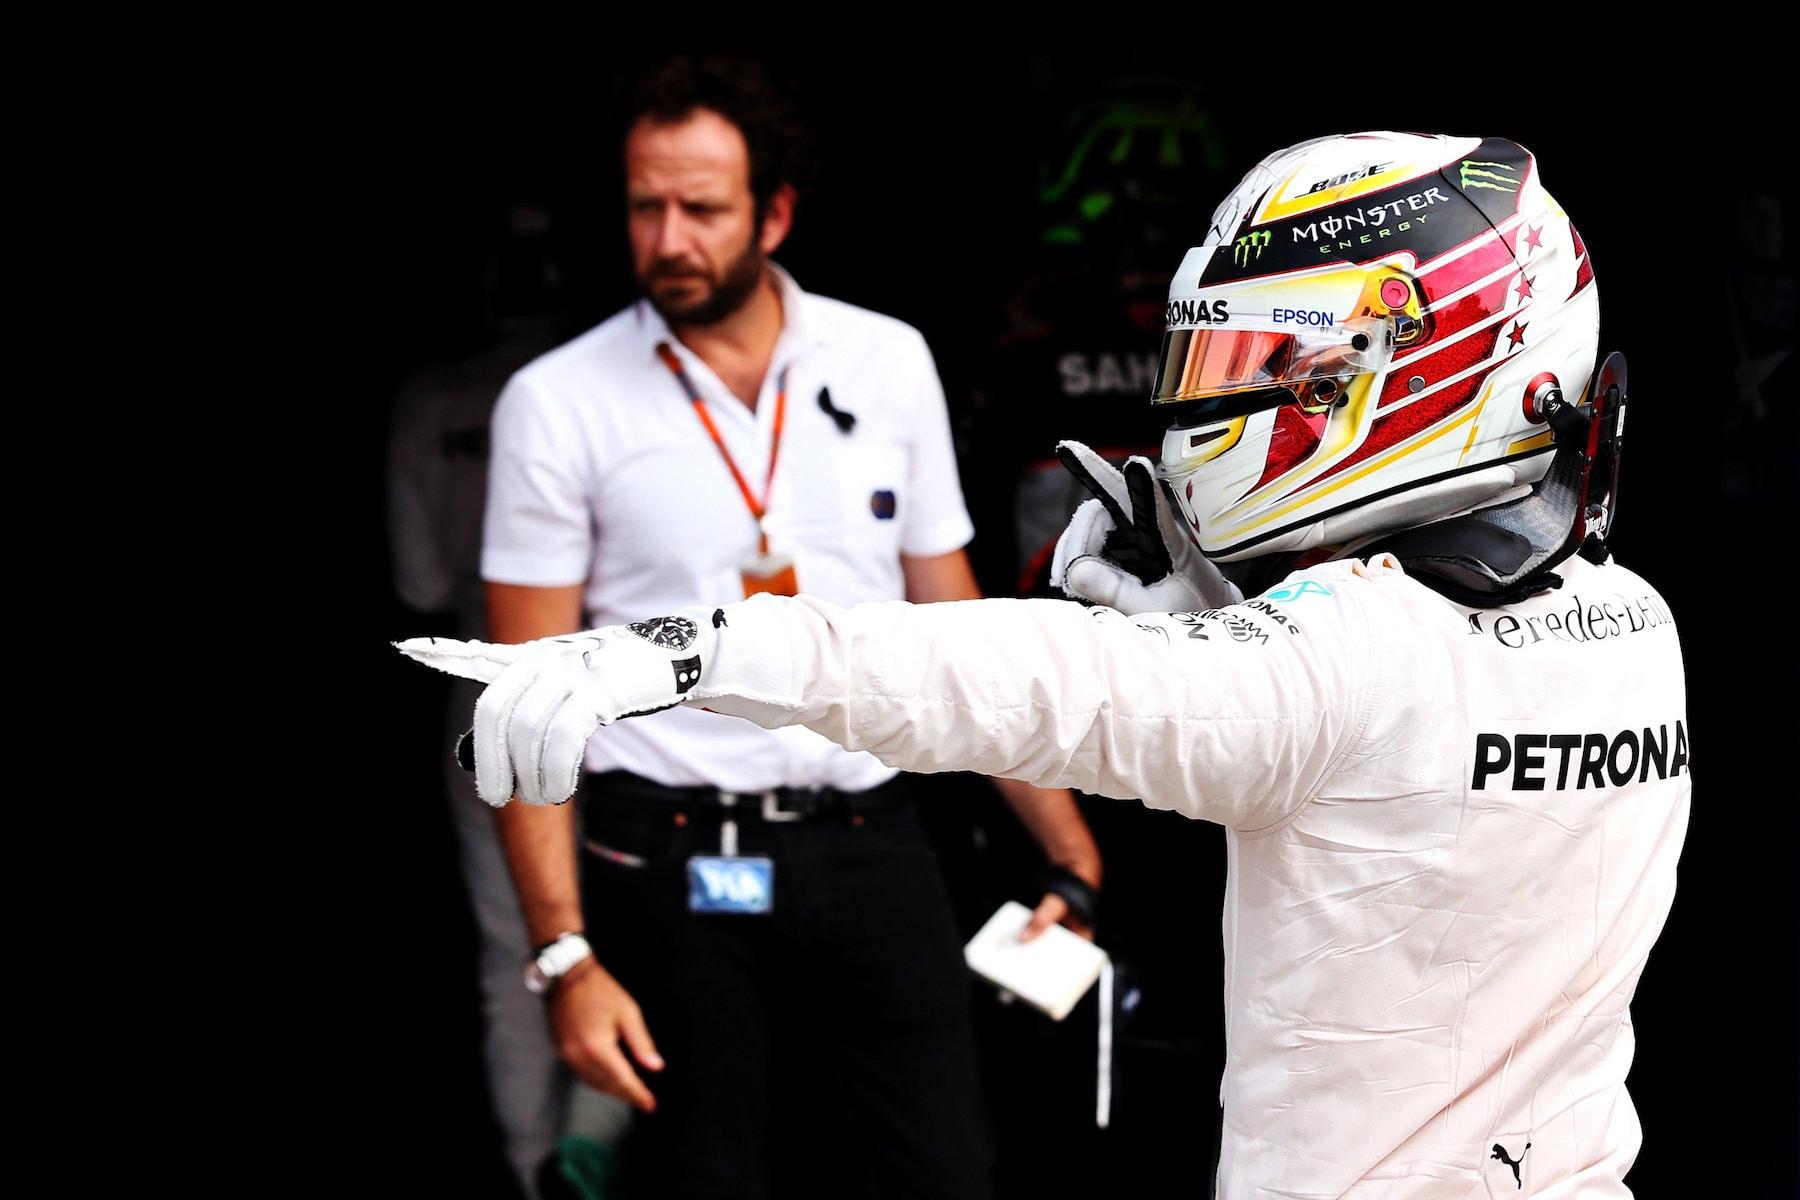 Salracing - Lewis Hamilton gets Pole at Monza